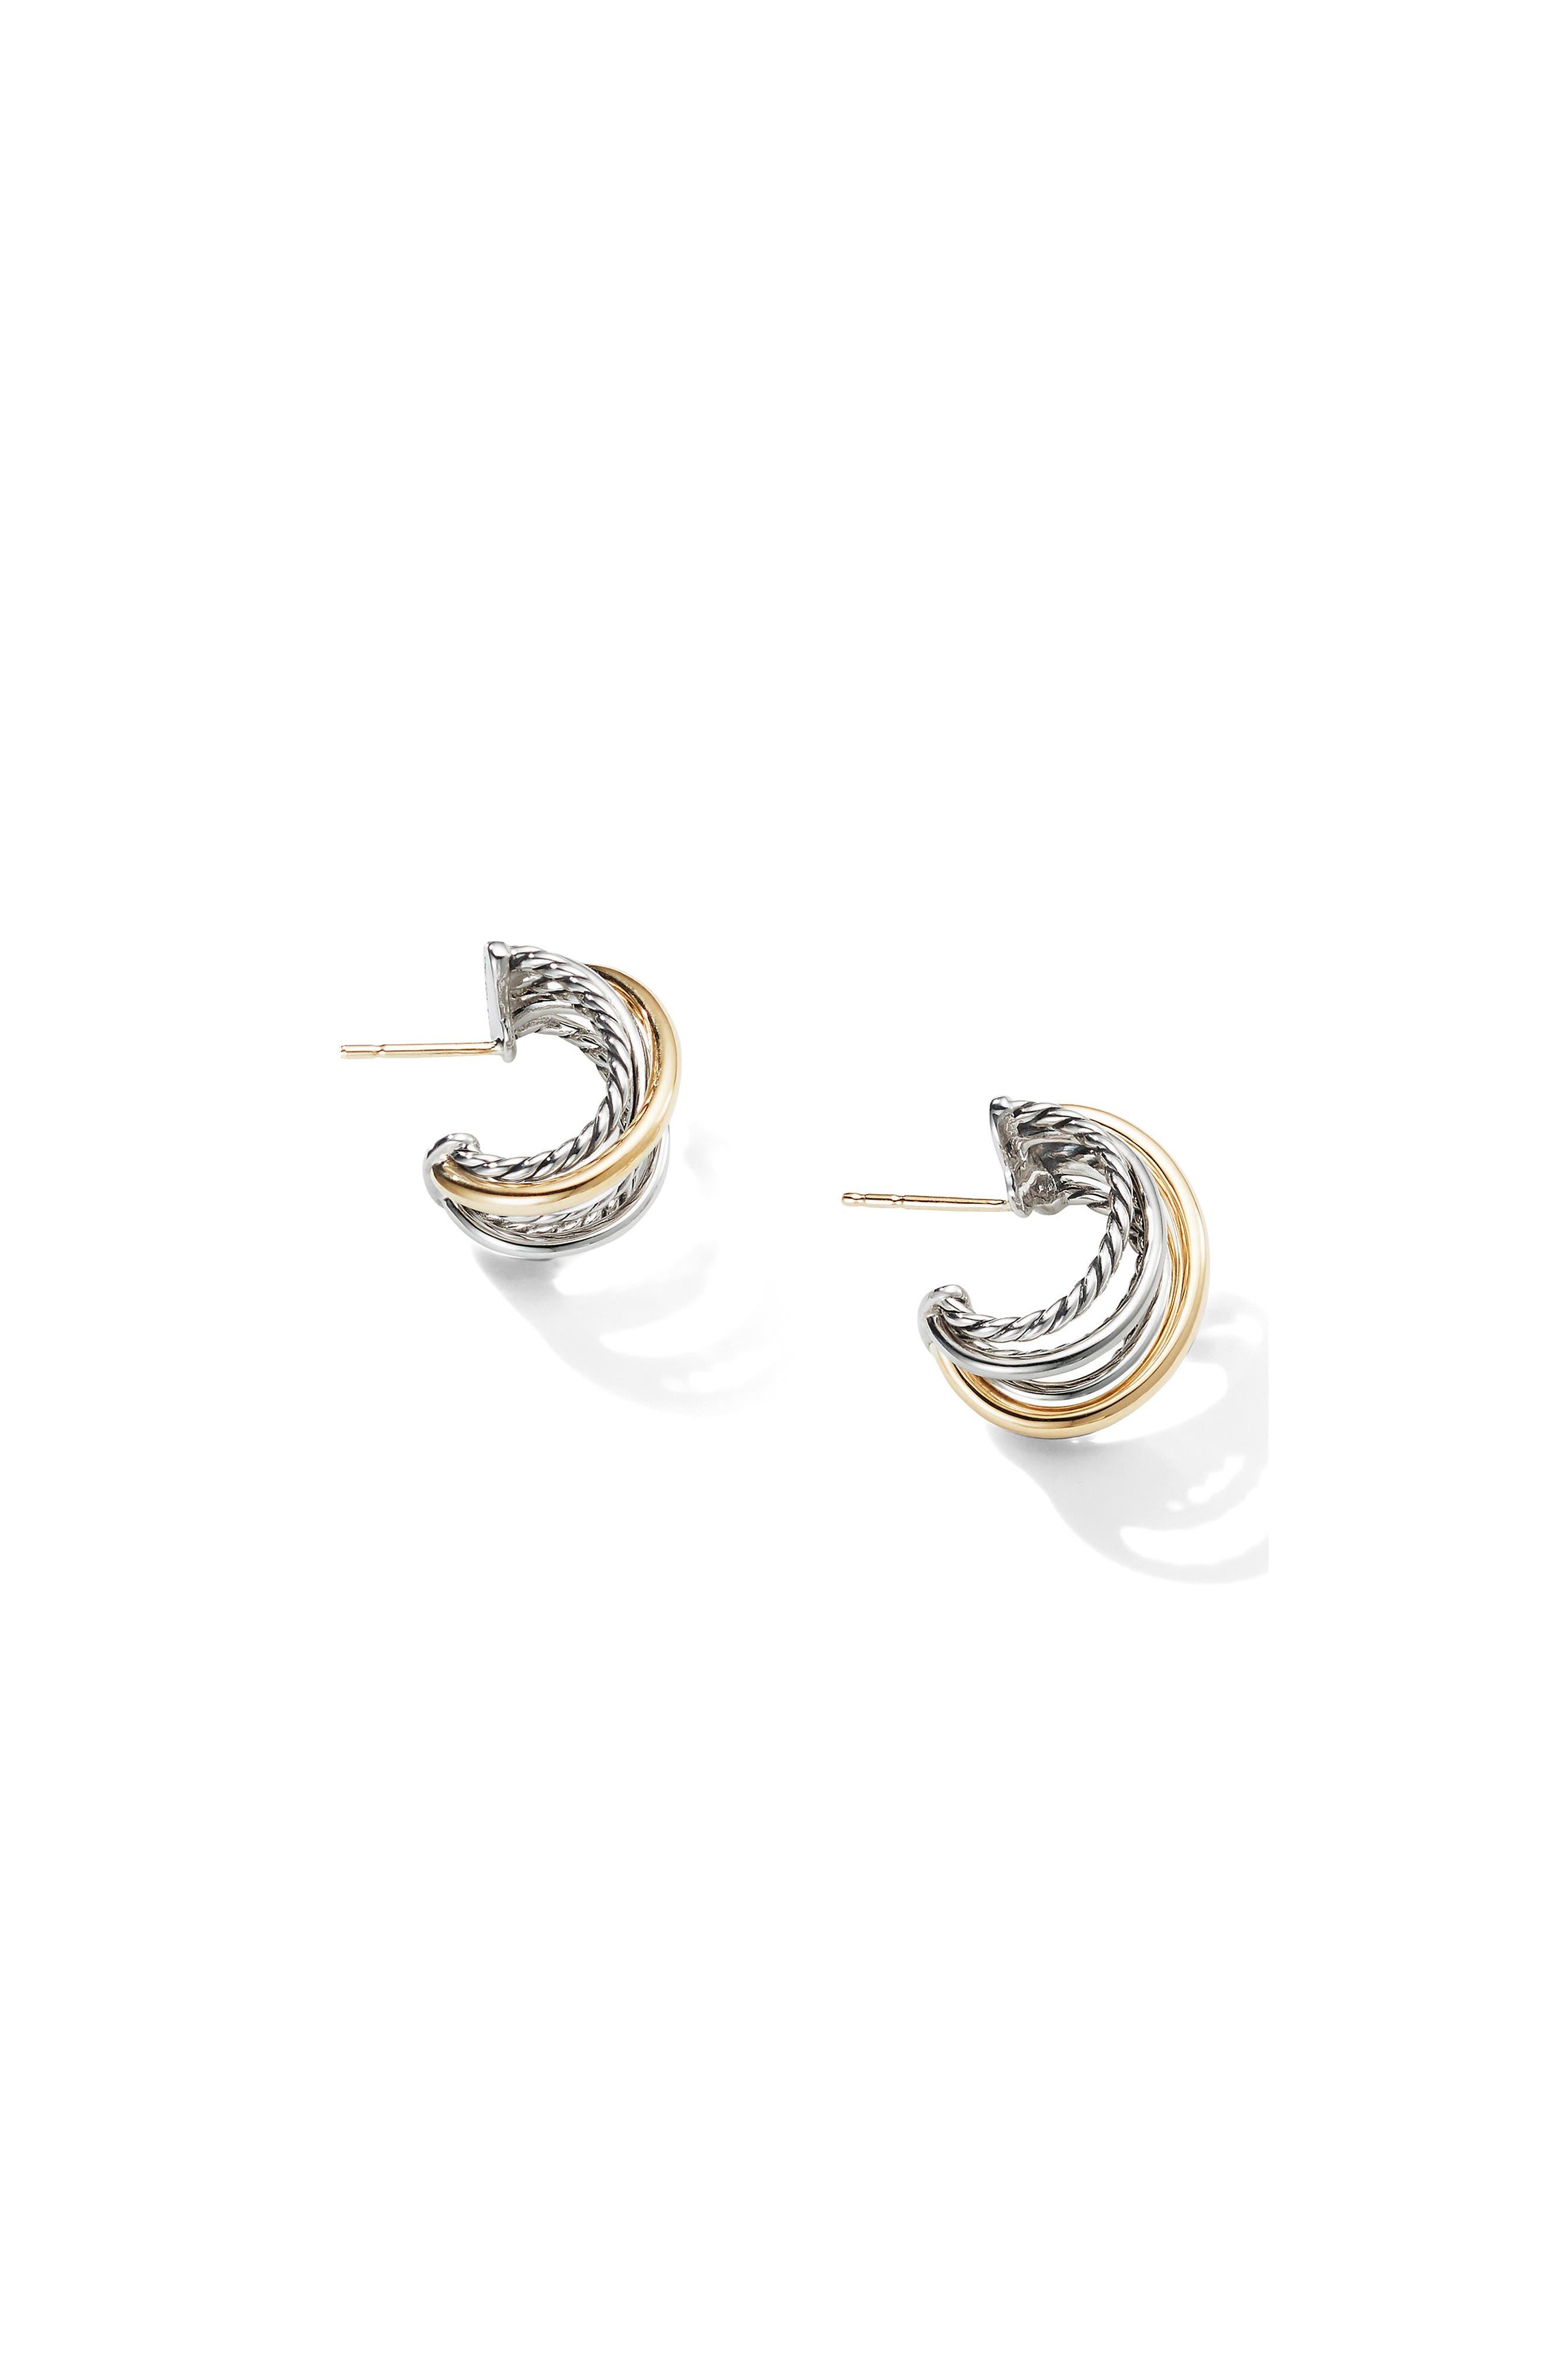 DAVID YURMAN, Crossover Huggie Hoop Earrings, Alternate thumbnail 2, color, SILVER/ GOLD